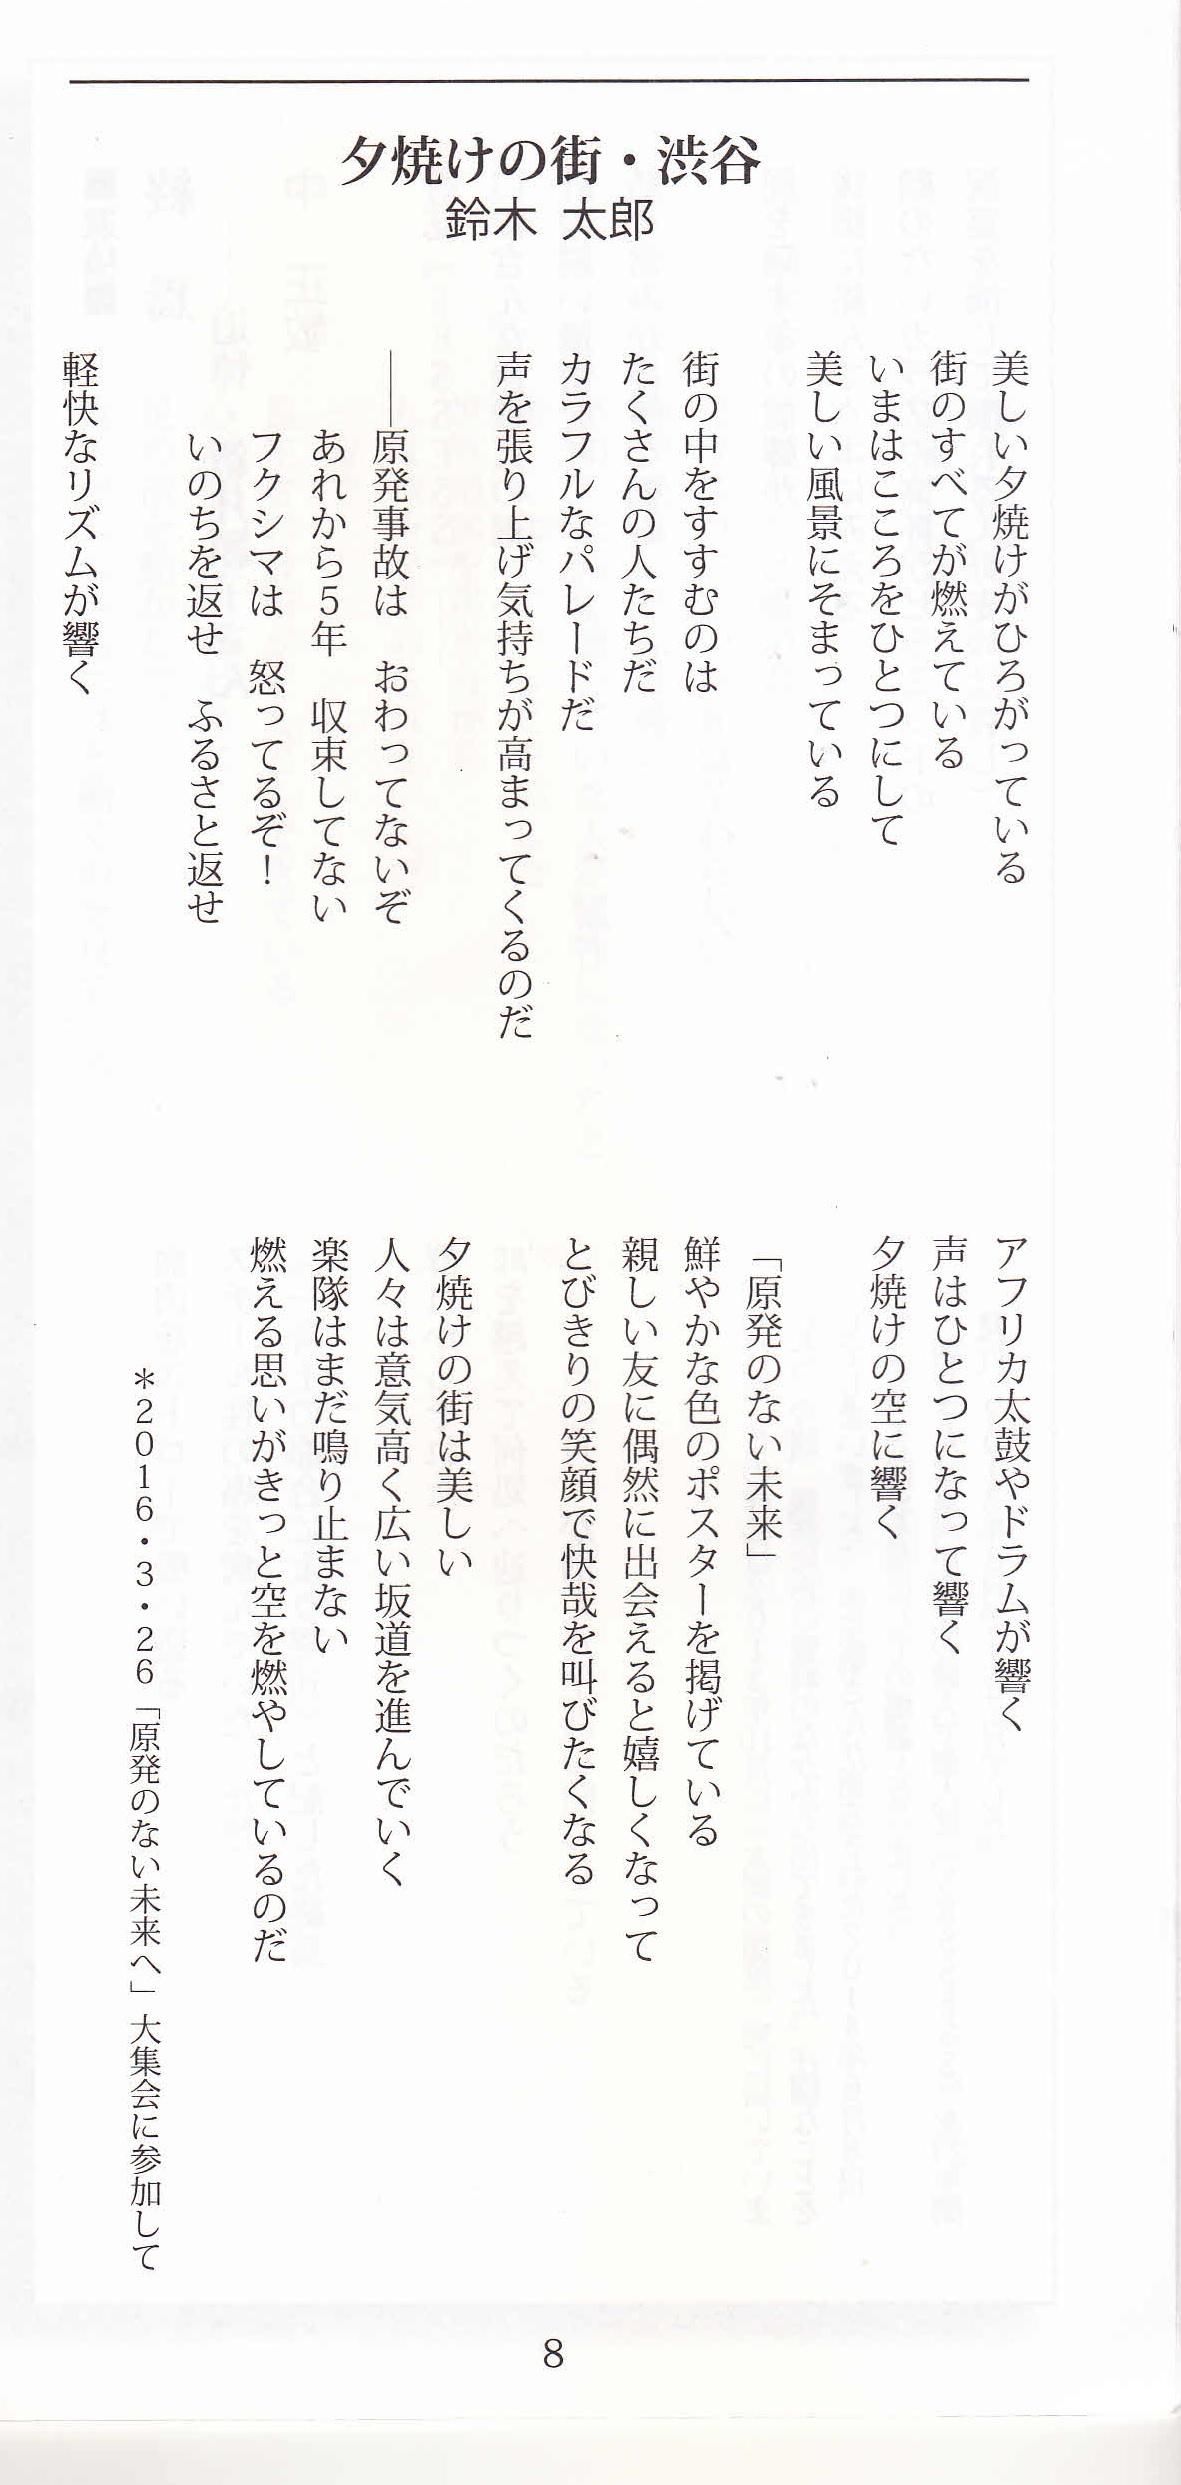 太郎の部屋 37号